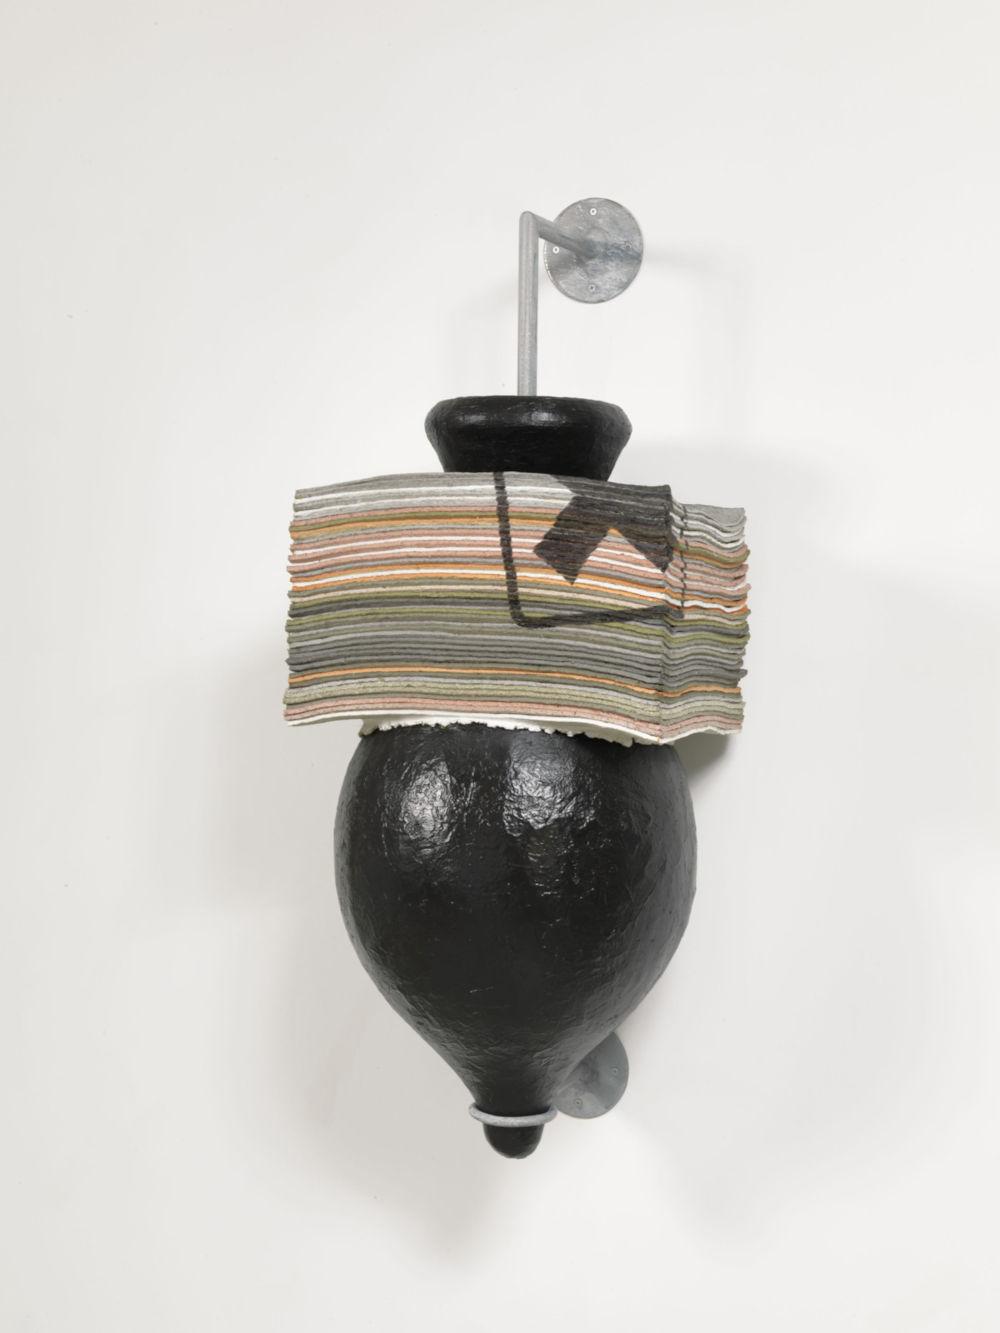 Perino & Vele, Elpìs 04, 2013. Papier-mâché, galvanized iron, fiberglass, bitumen, tempera (43 sheets), 126x48.5x49 cm